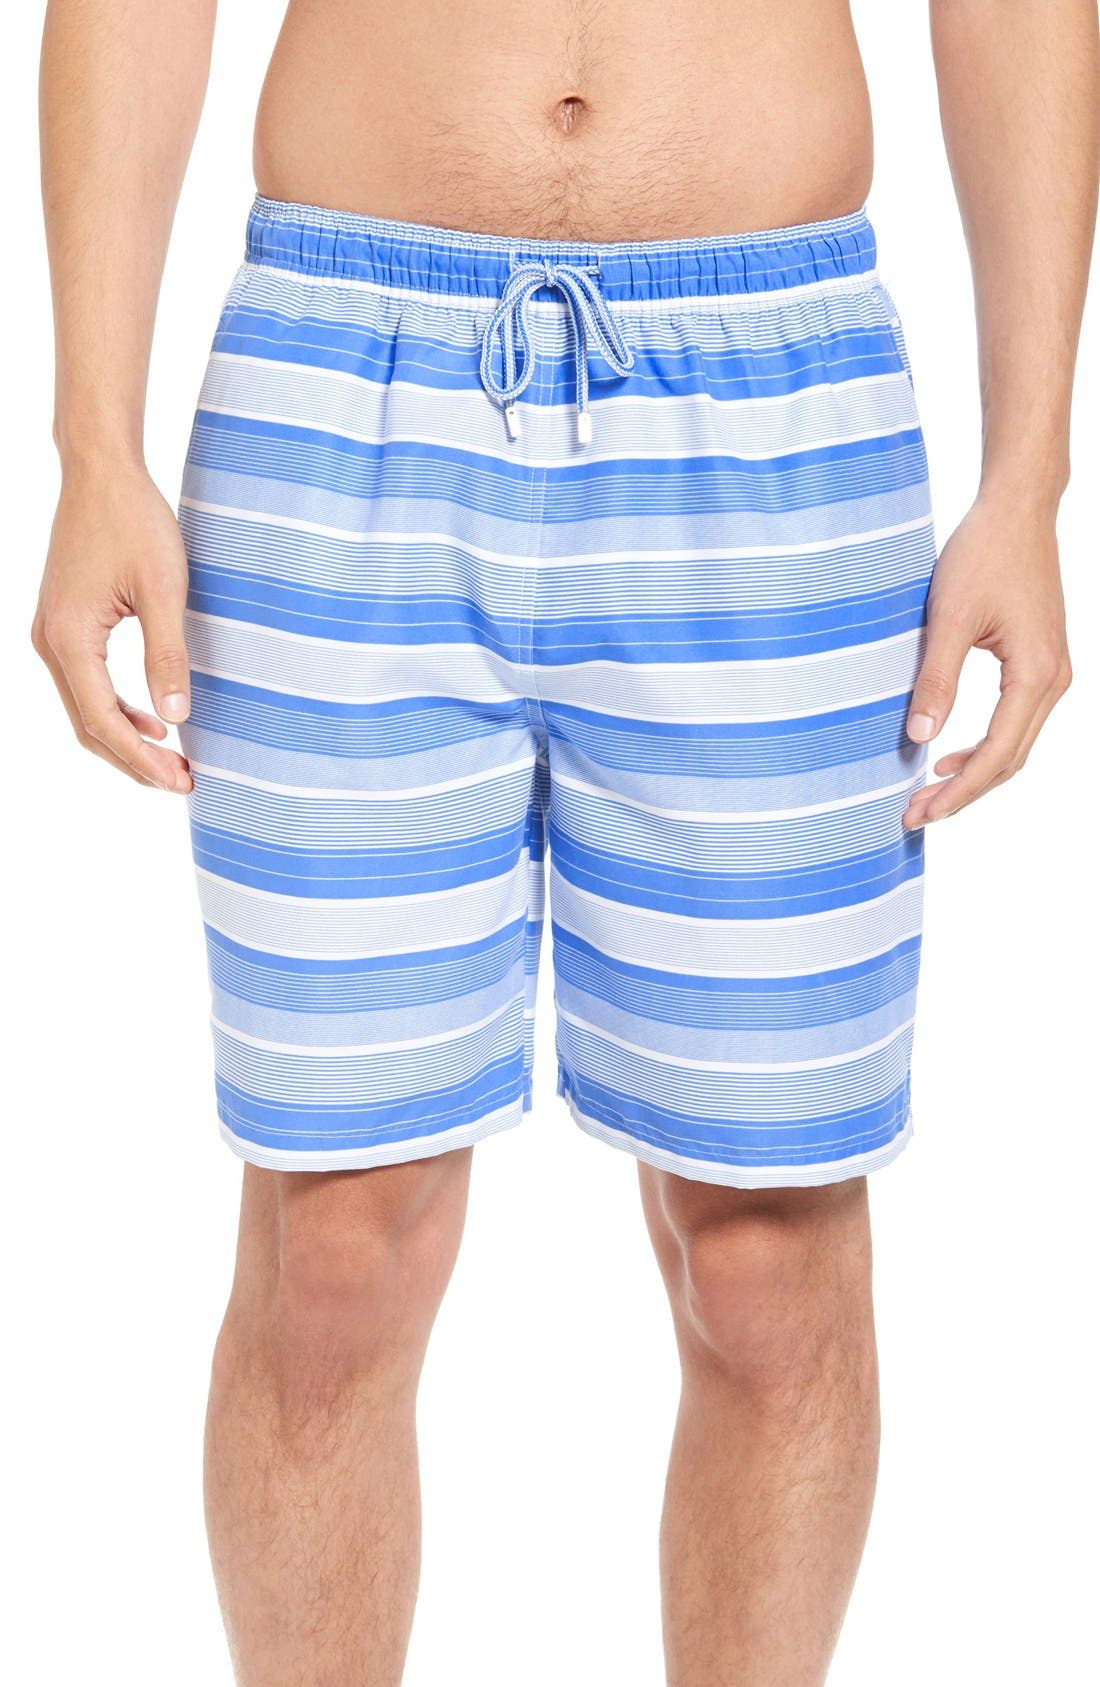 Peter Millar Vintage Stripe Swim Trunks